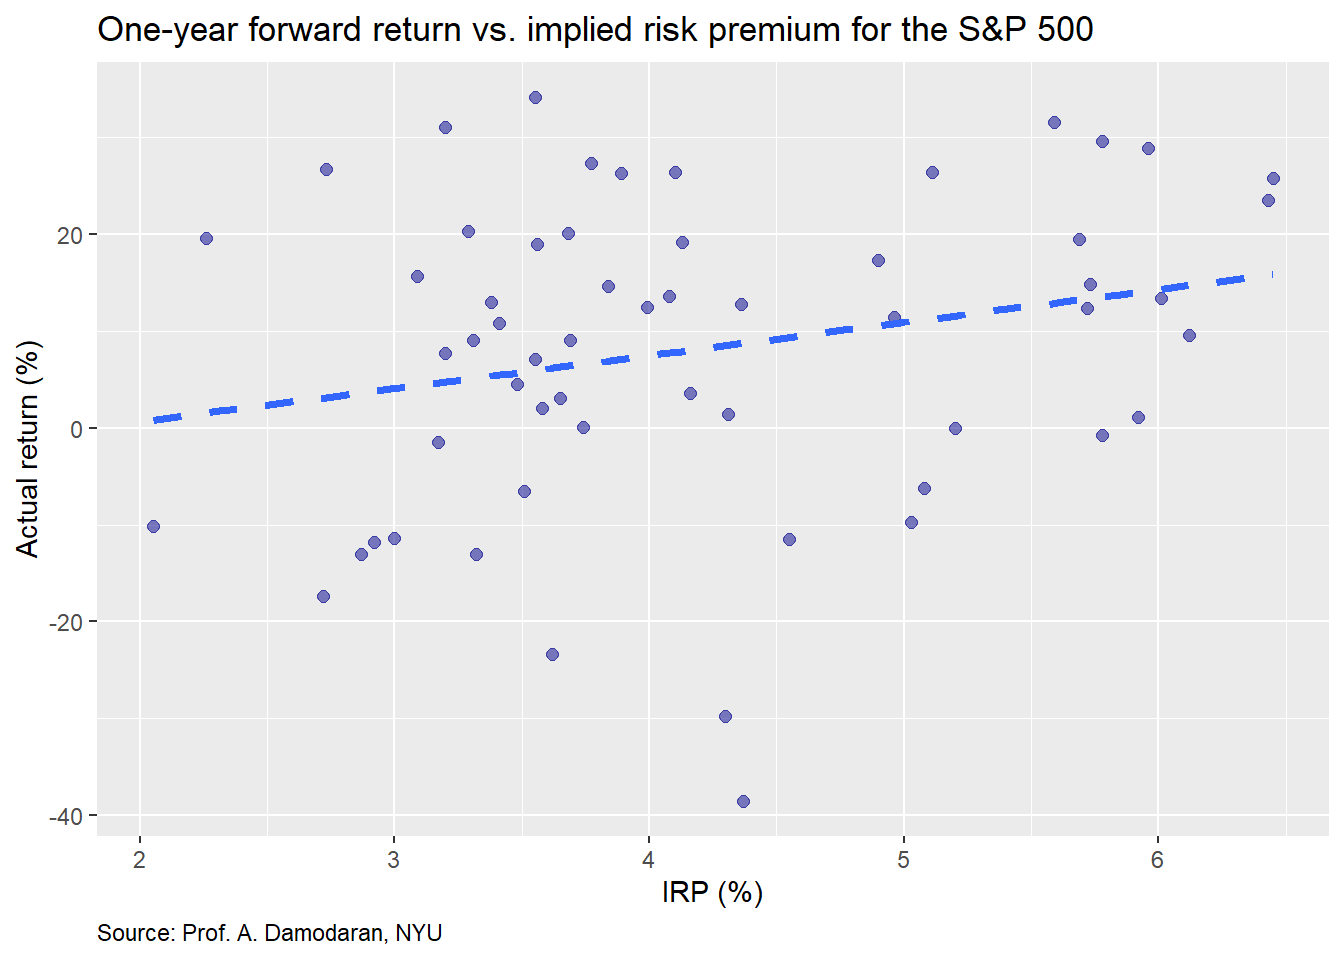 Implied risk premia